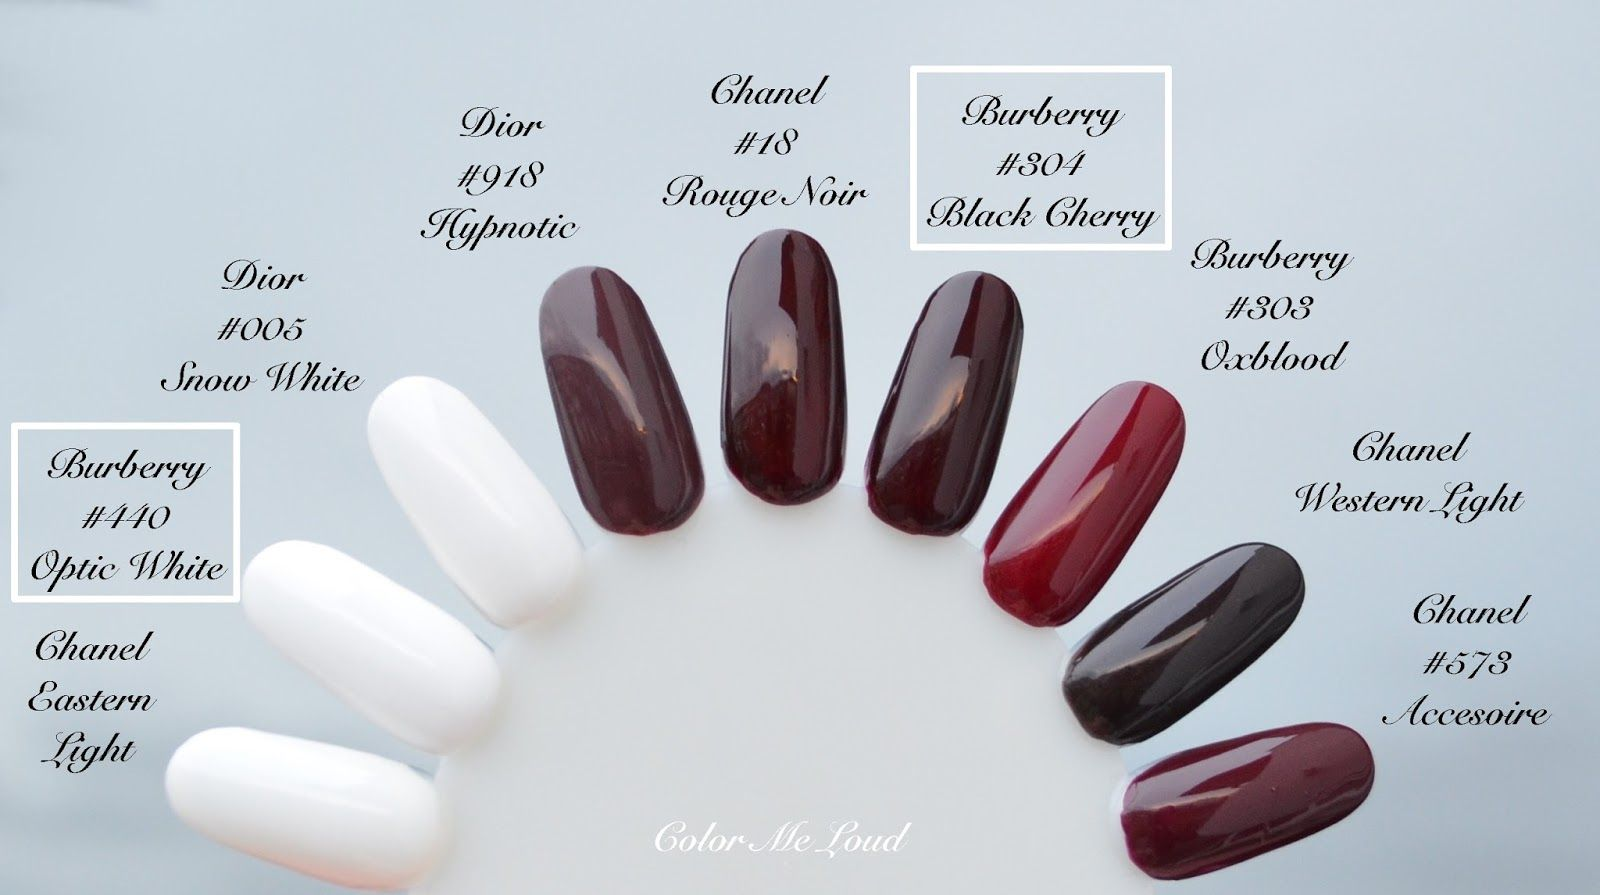 Burberry Nail Polish #440 Optic White, #304 Black Cherry for Spring ...